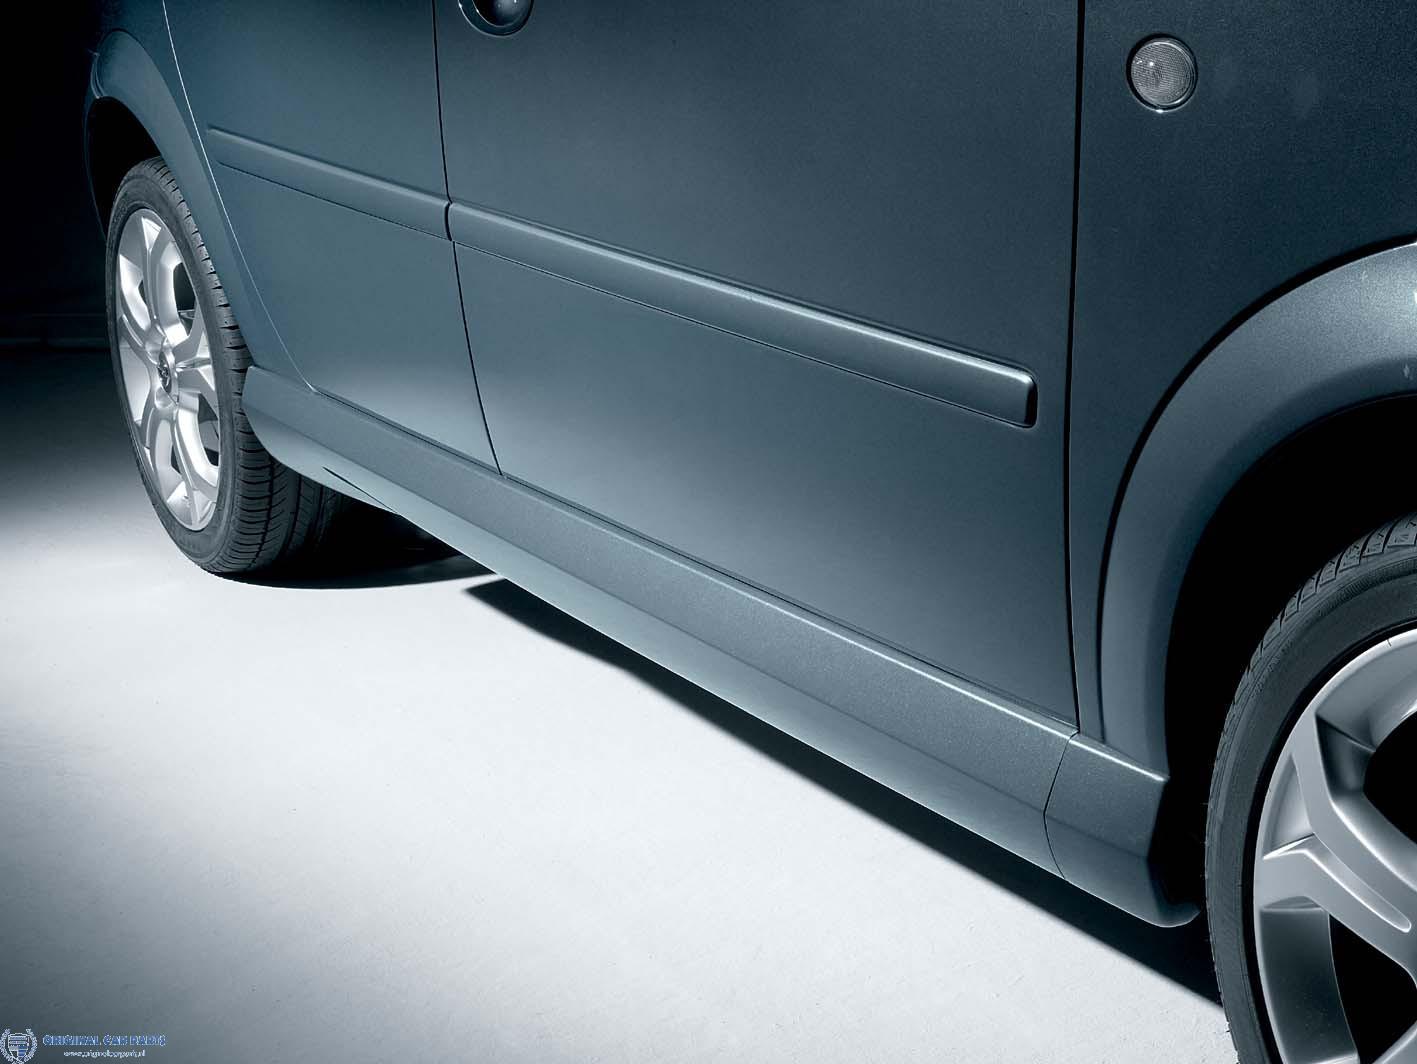 Opel Meriva A OPC-line sideskirts